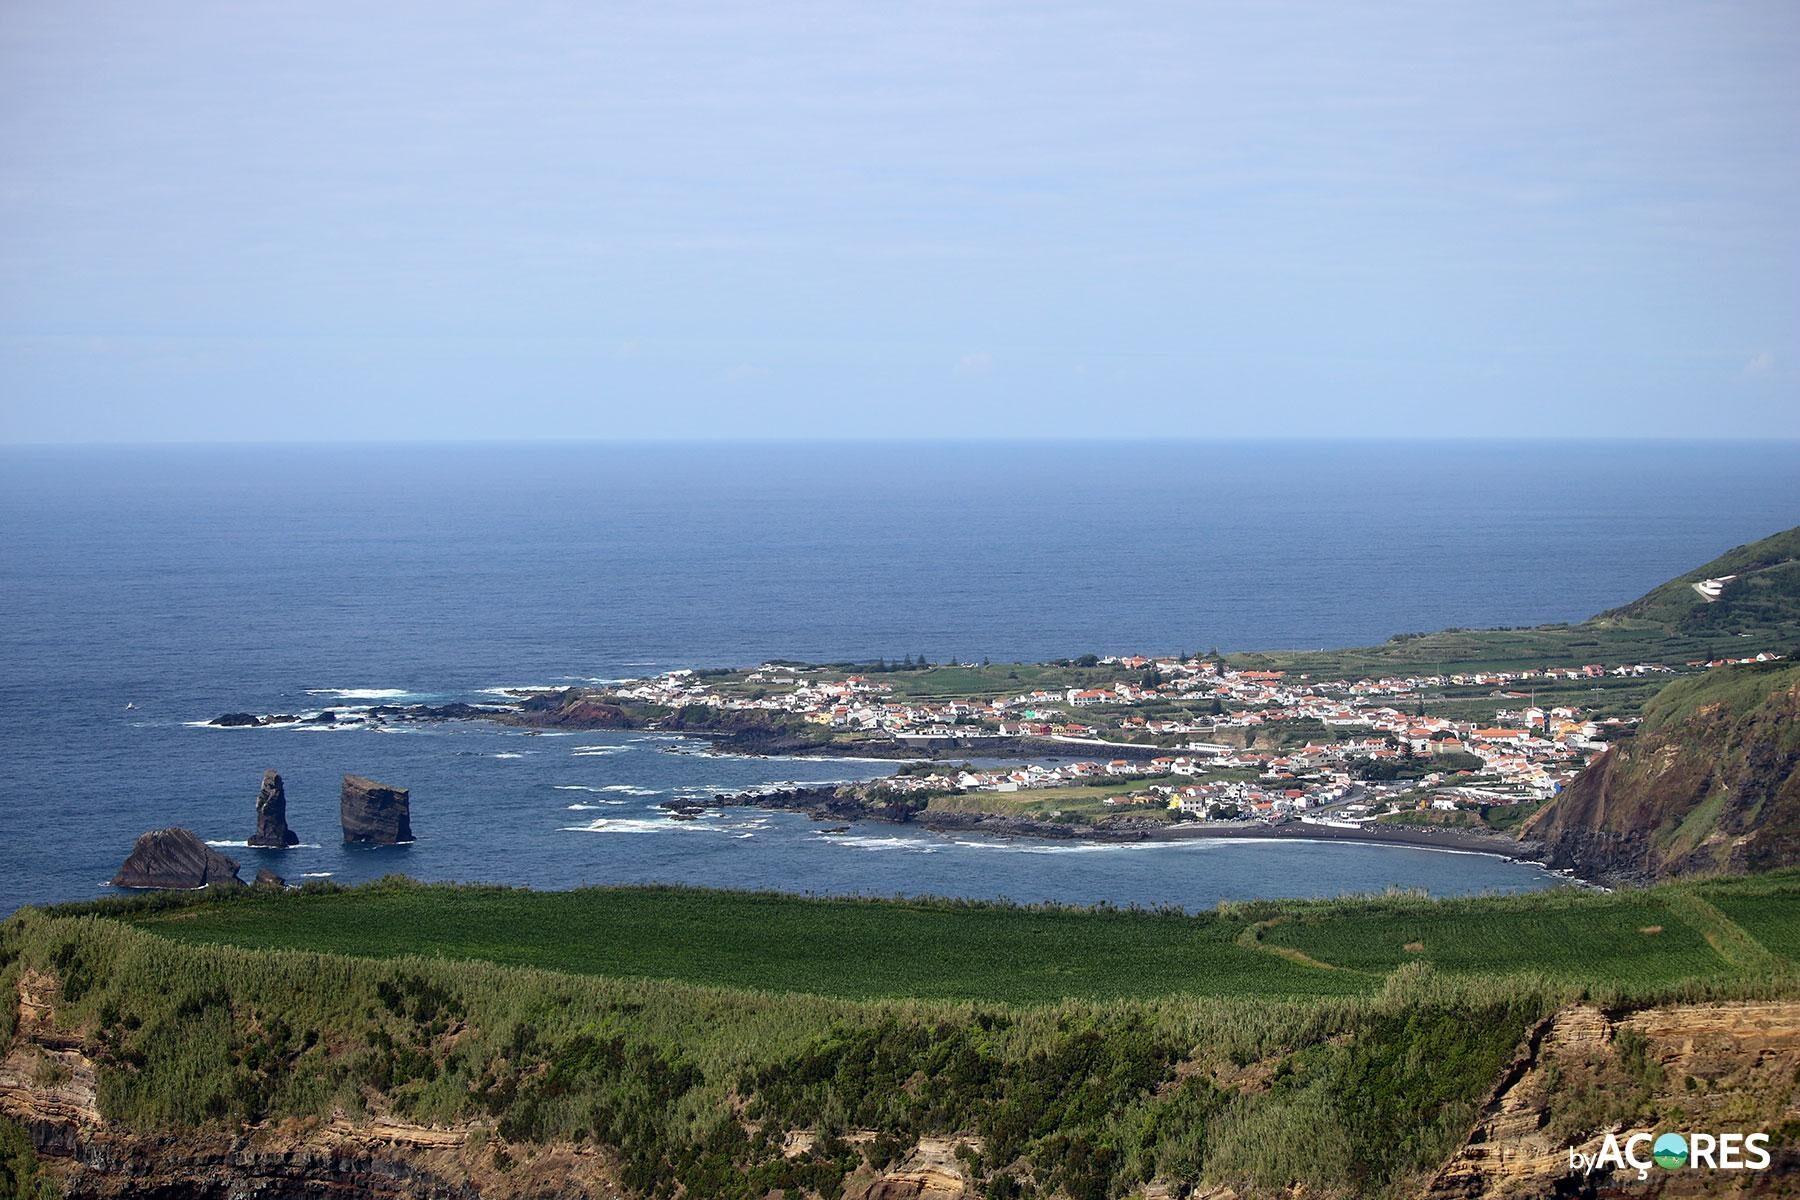 Mosteiros vista Miradouro da Ponta do Escalvado